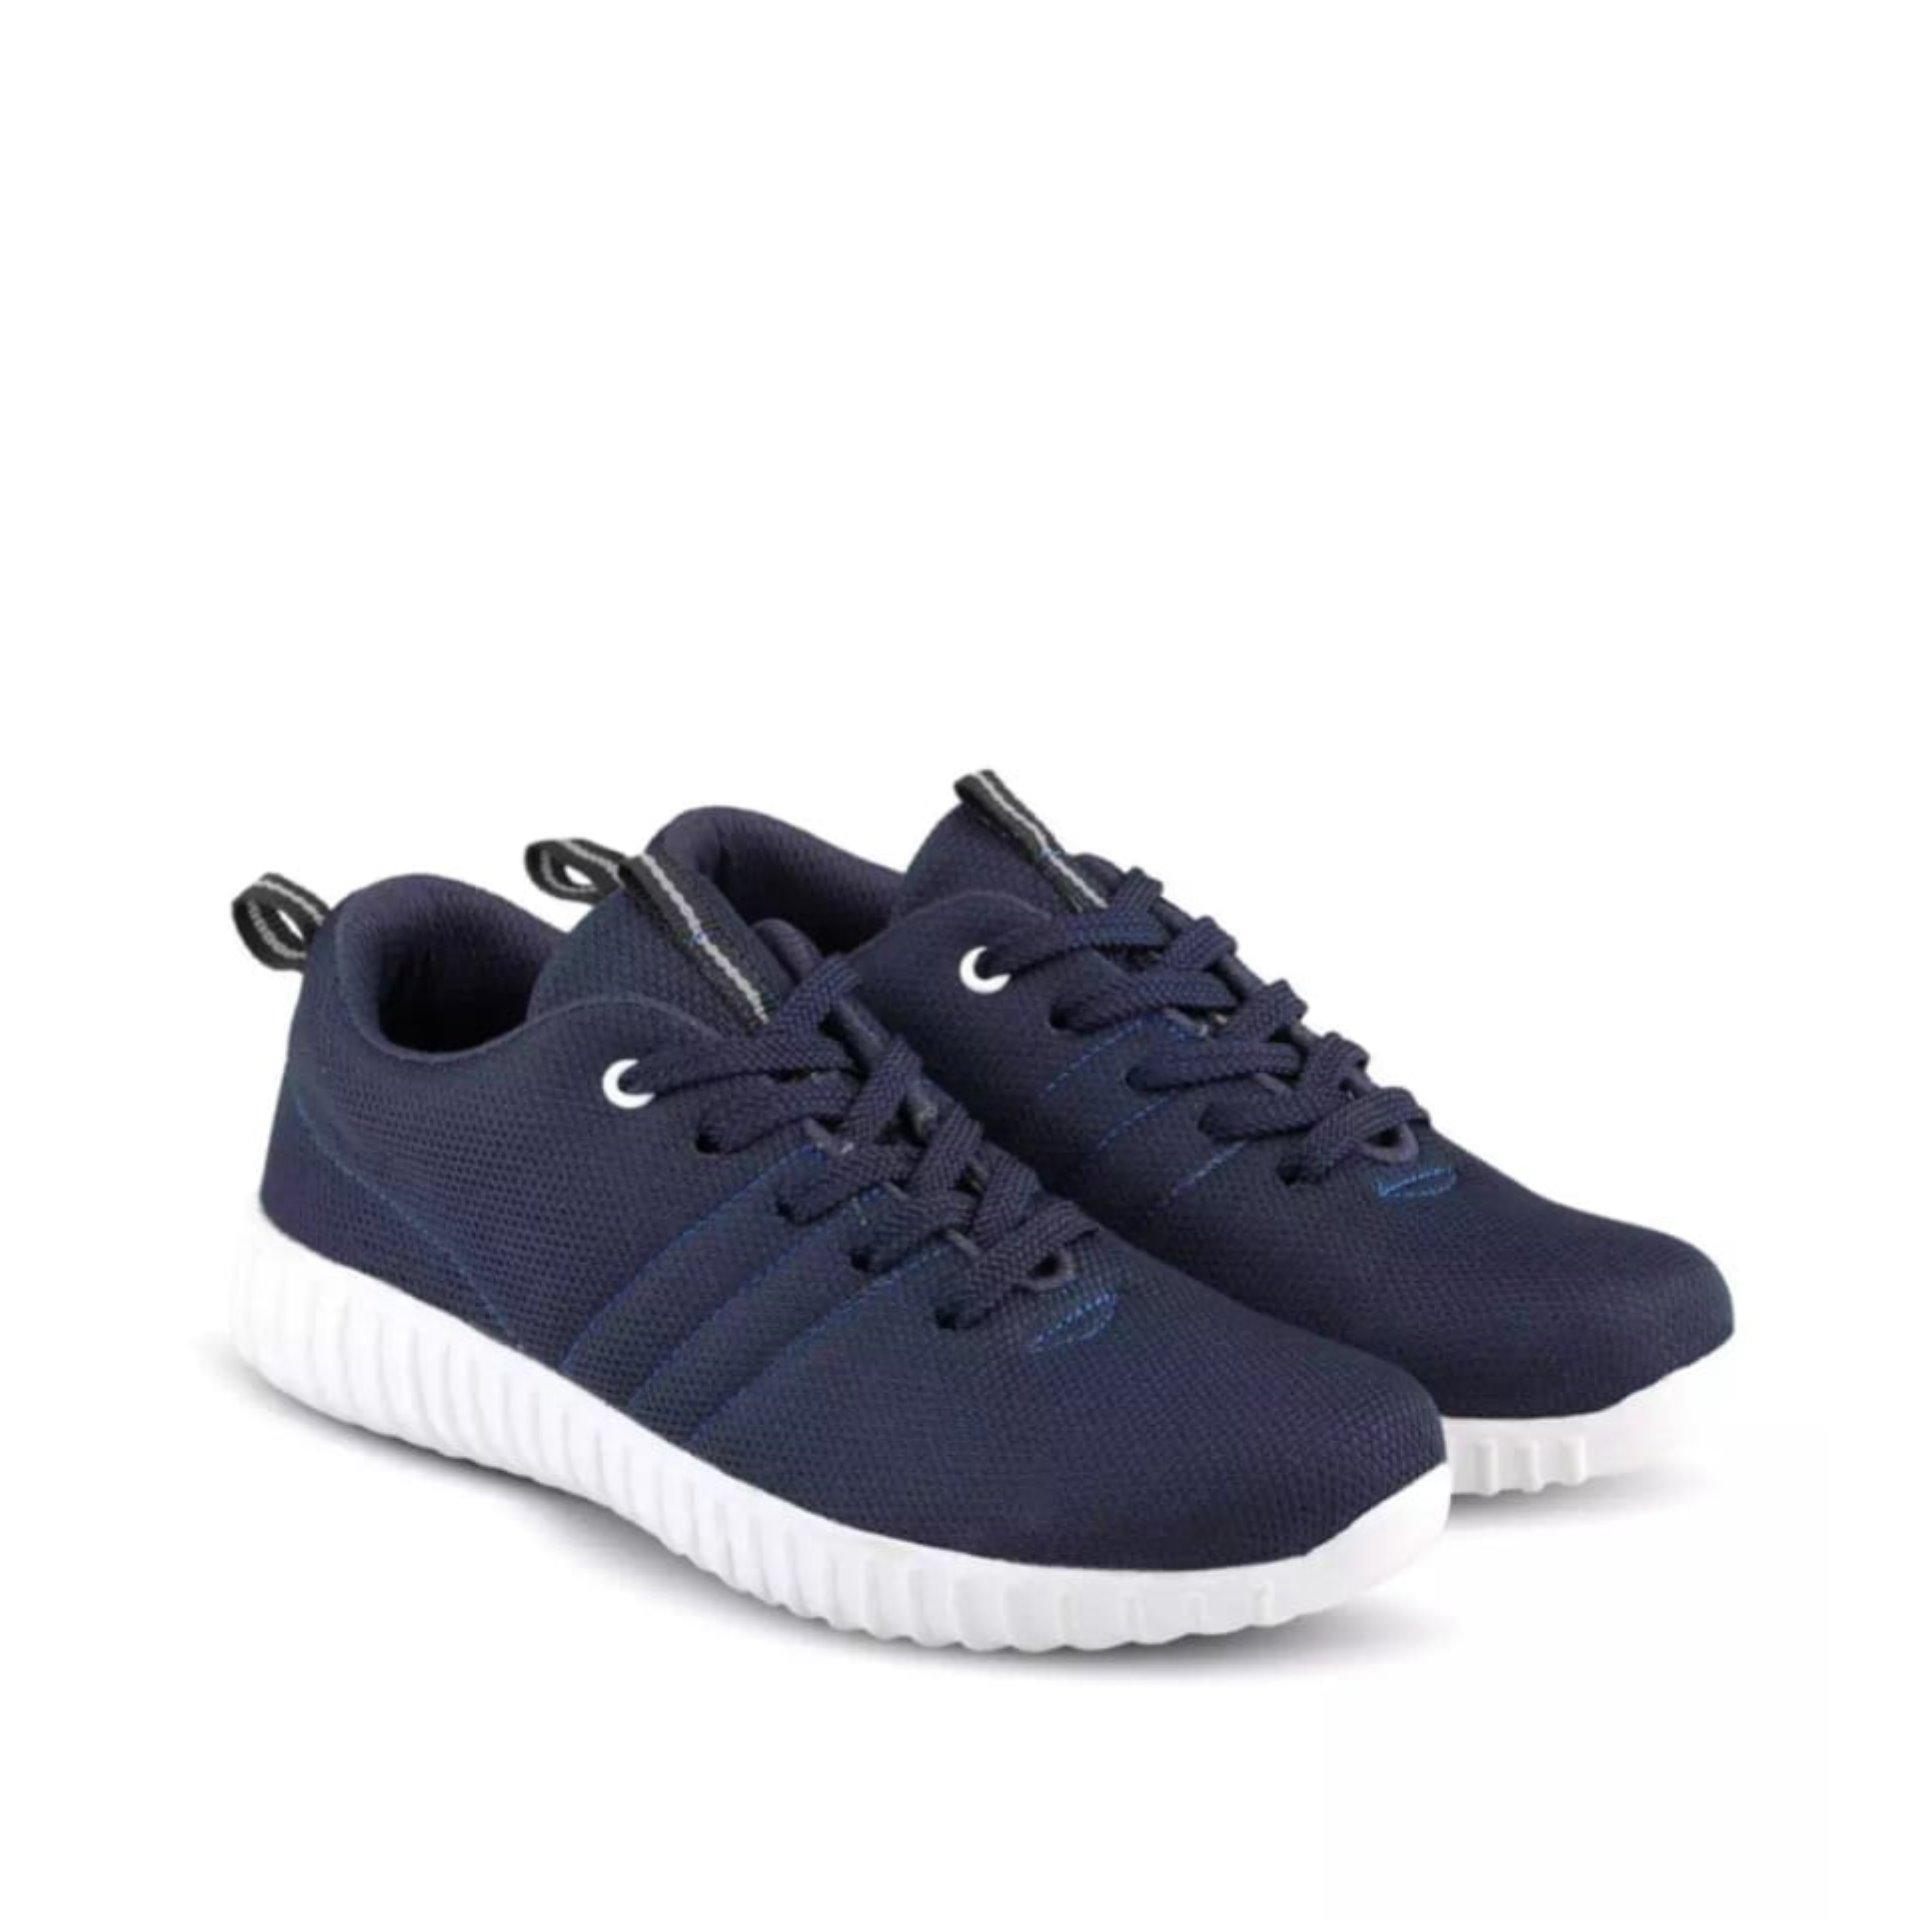 Adinova Shoes Sepatu Sport Adinio Sepatu Olahraga Sepatu Gaya Adinio Sepatu Santai Sepatu Pria L10 NEW Series